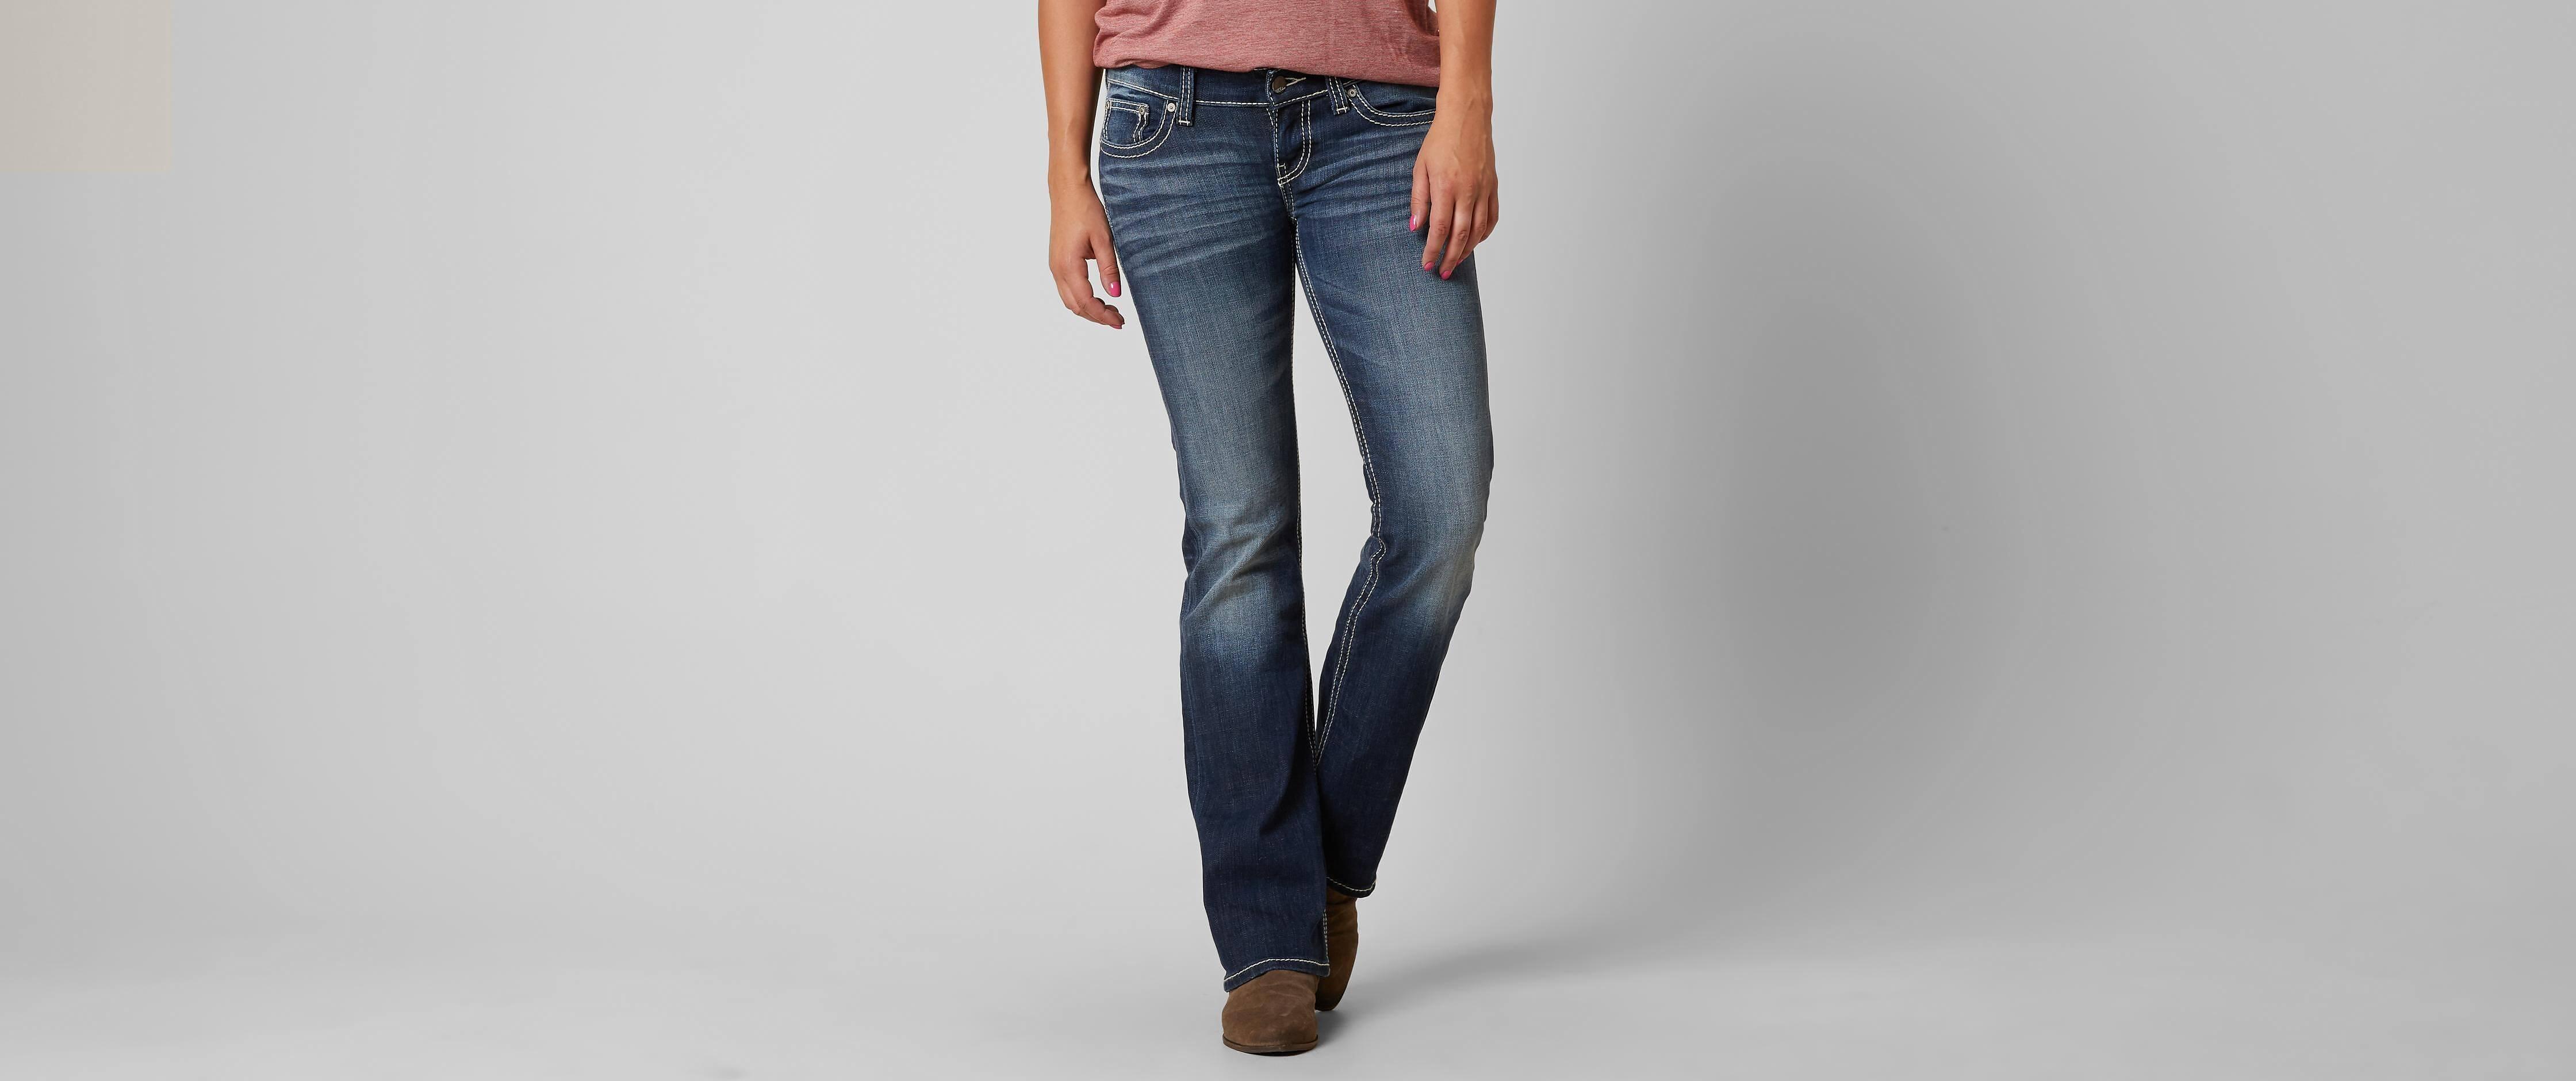 Stella boot stretch jean also bke women   jeans in hoven buckle rh